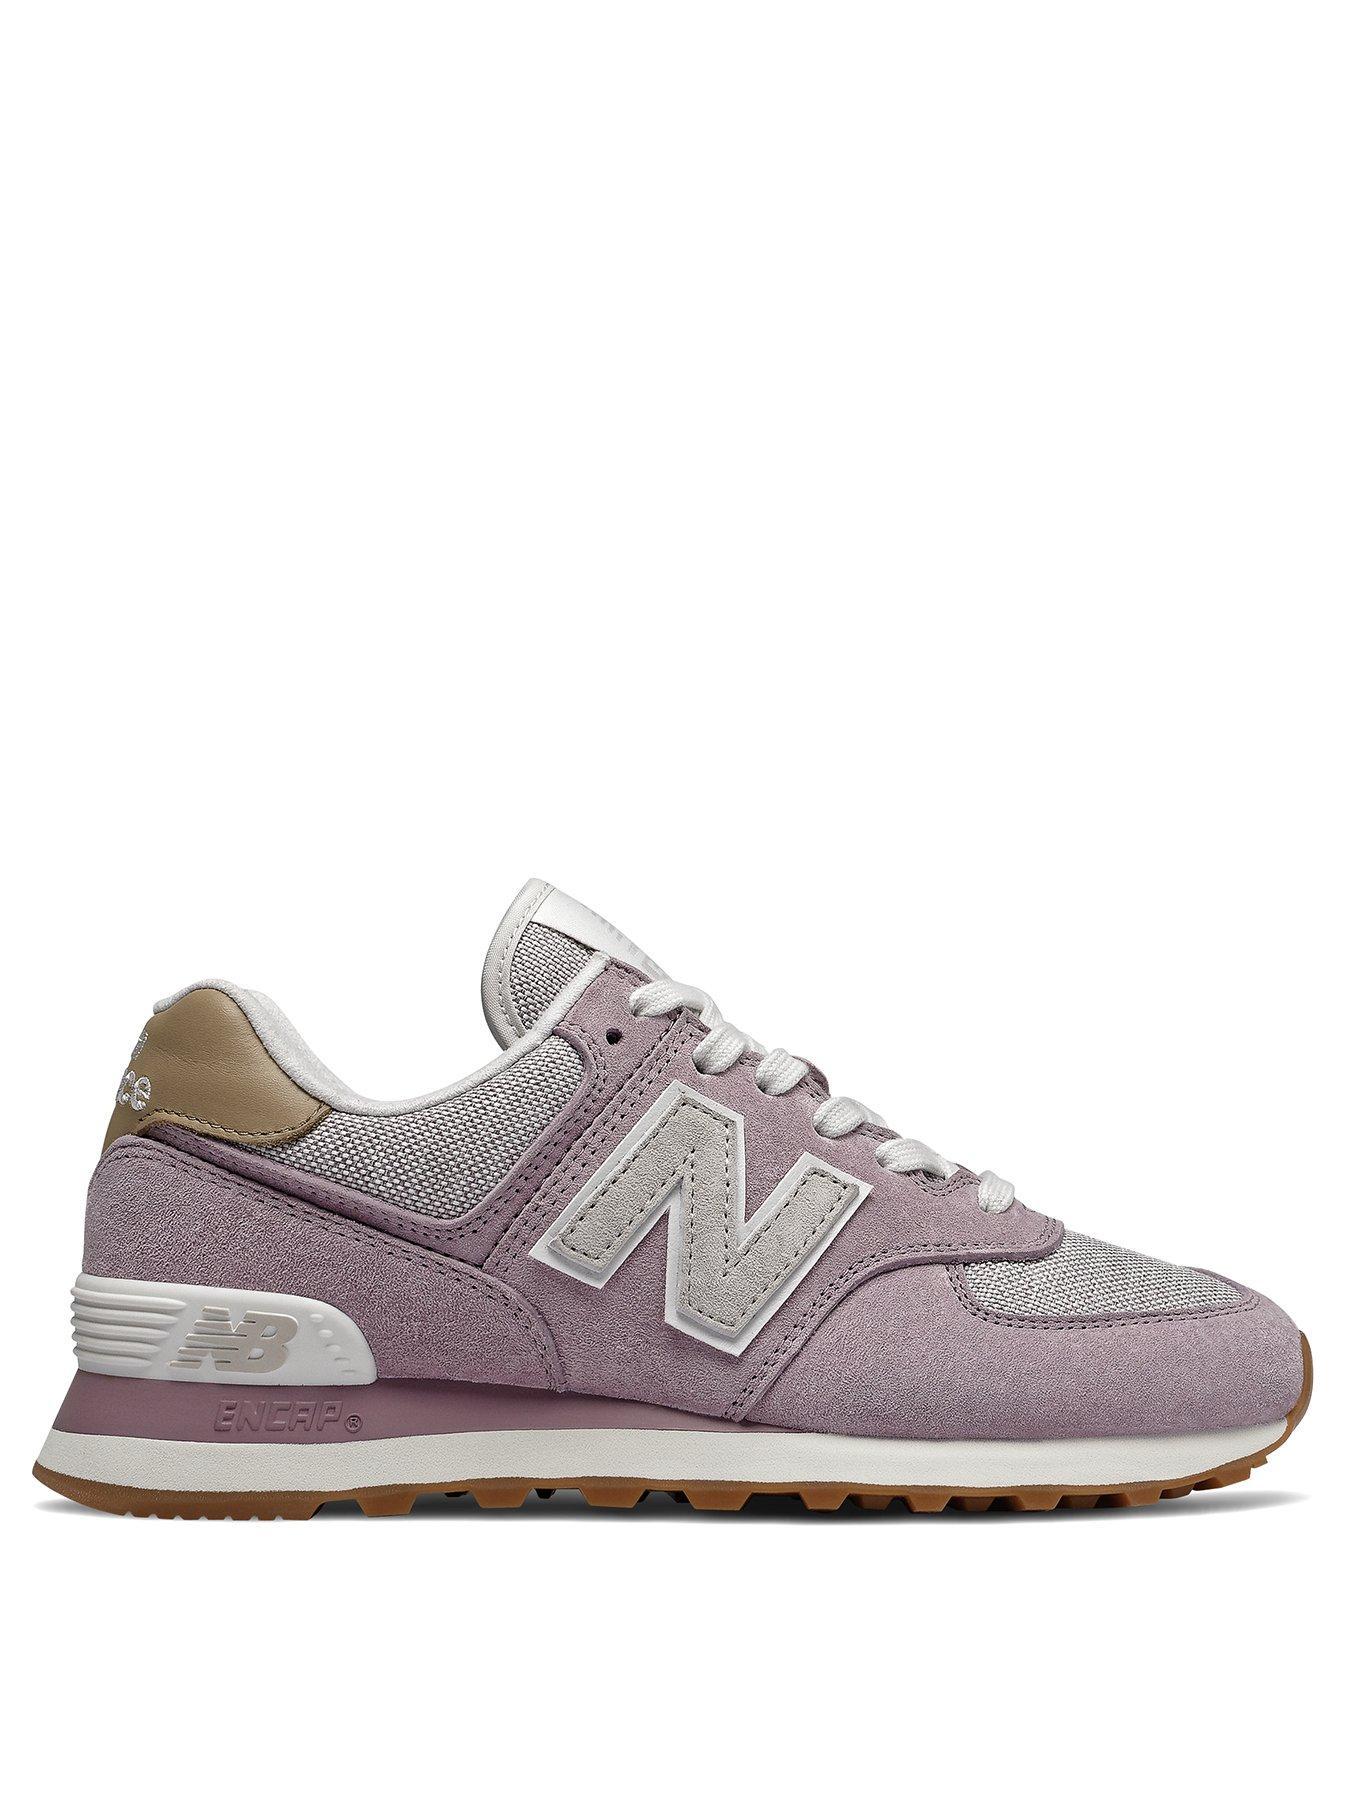 new balance trainers women 574 pink